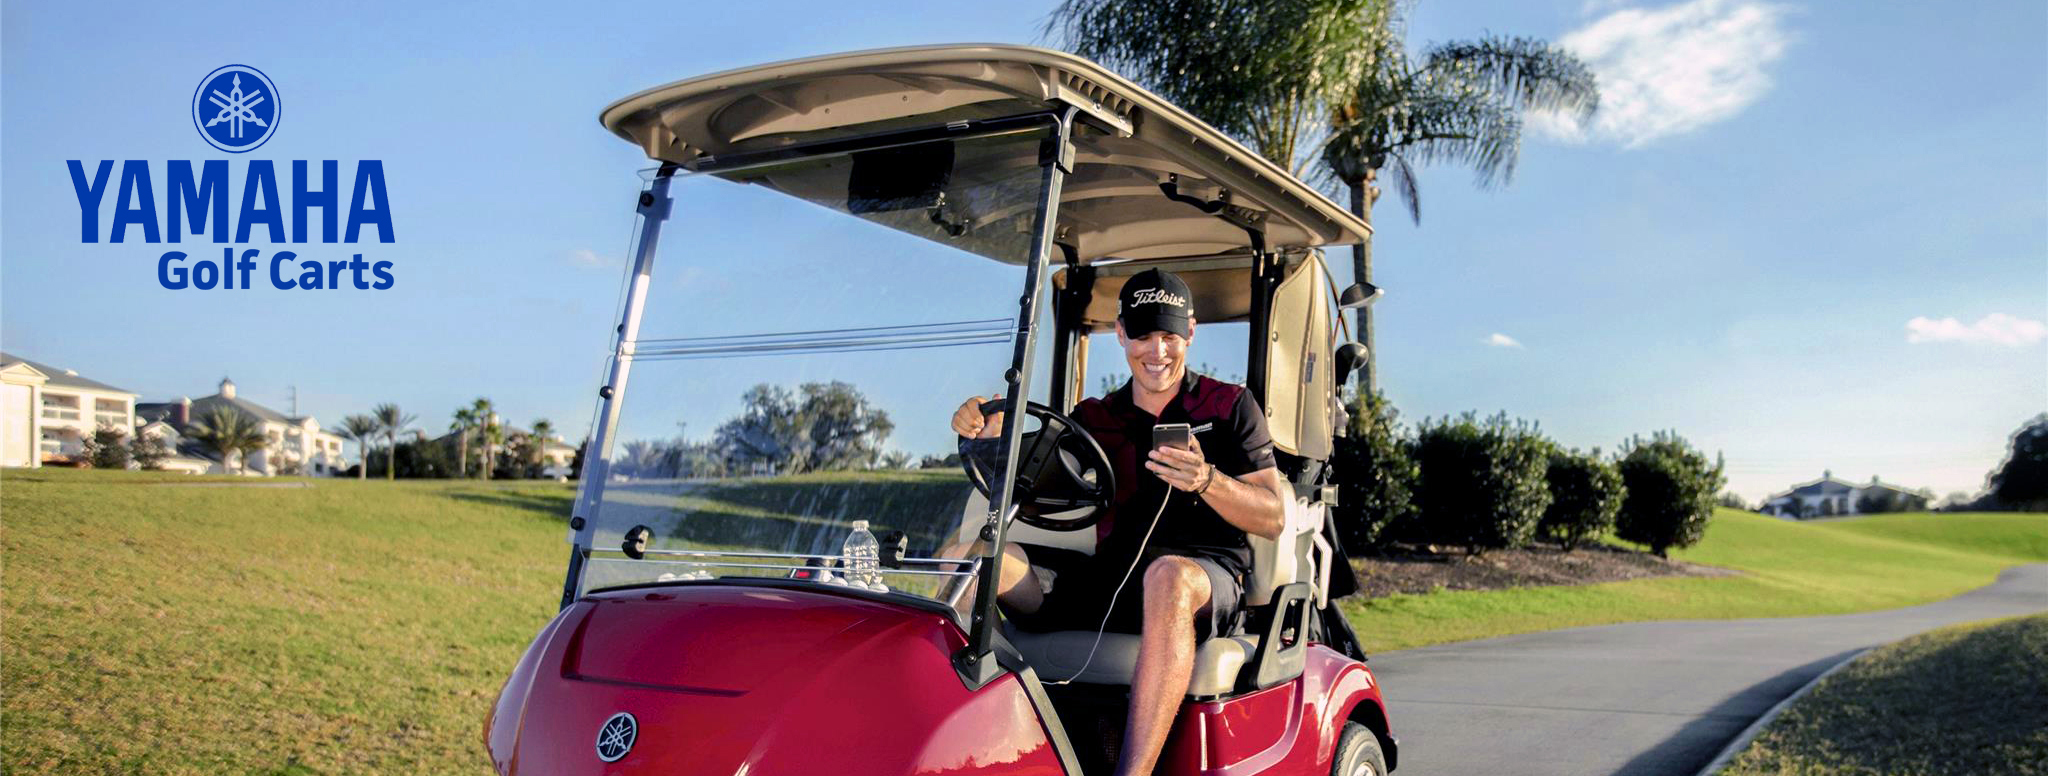 Golf Carts | Southern Lawn Equipment | West Palm Beach, FL